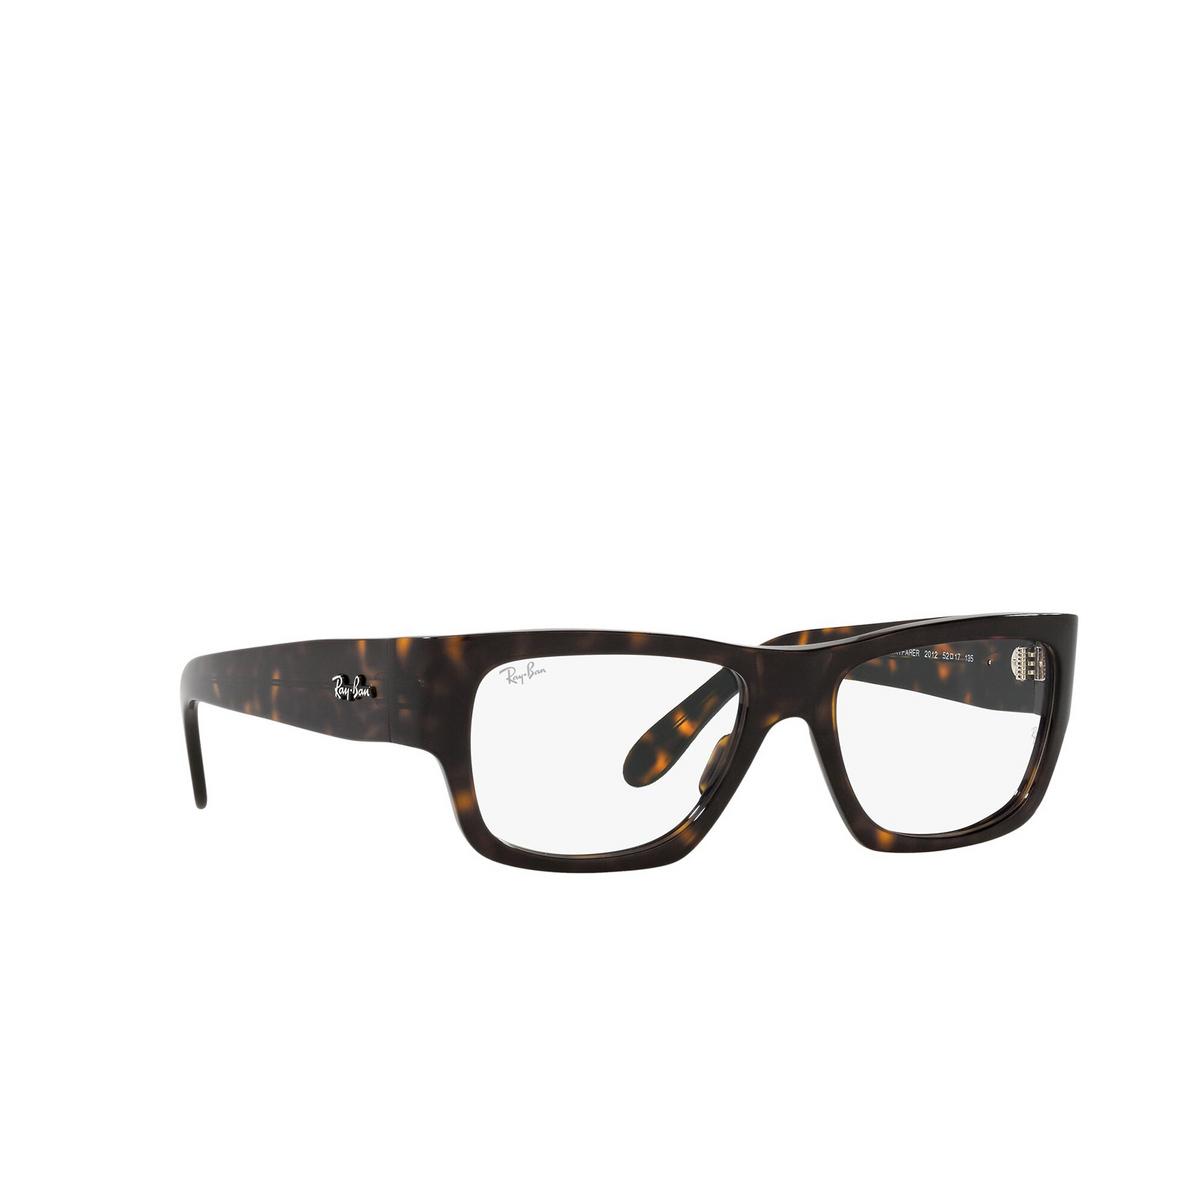 Ray-Ban® Square Eyeglasses: Nomad Wayfarer RX5487 color Havana 2012 - three-quarters view.